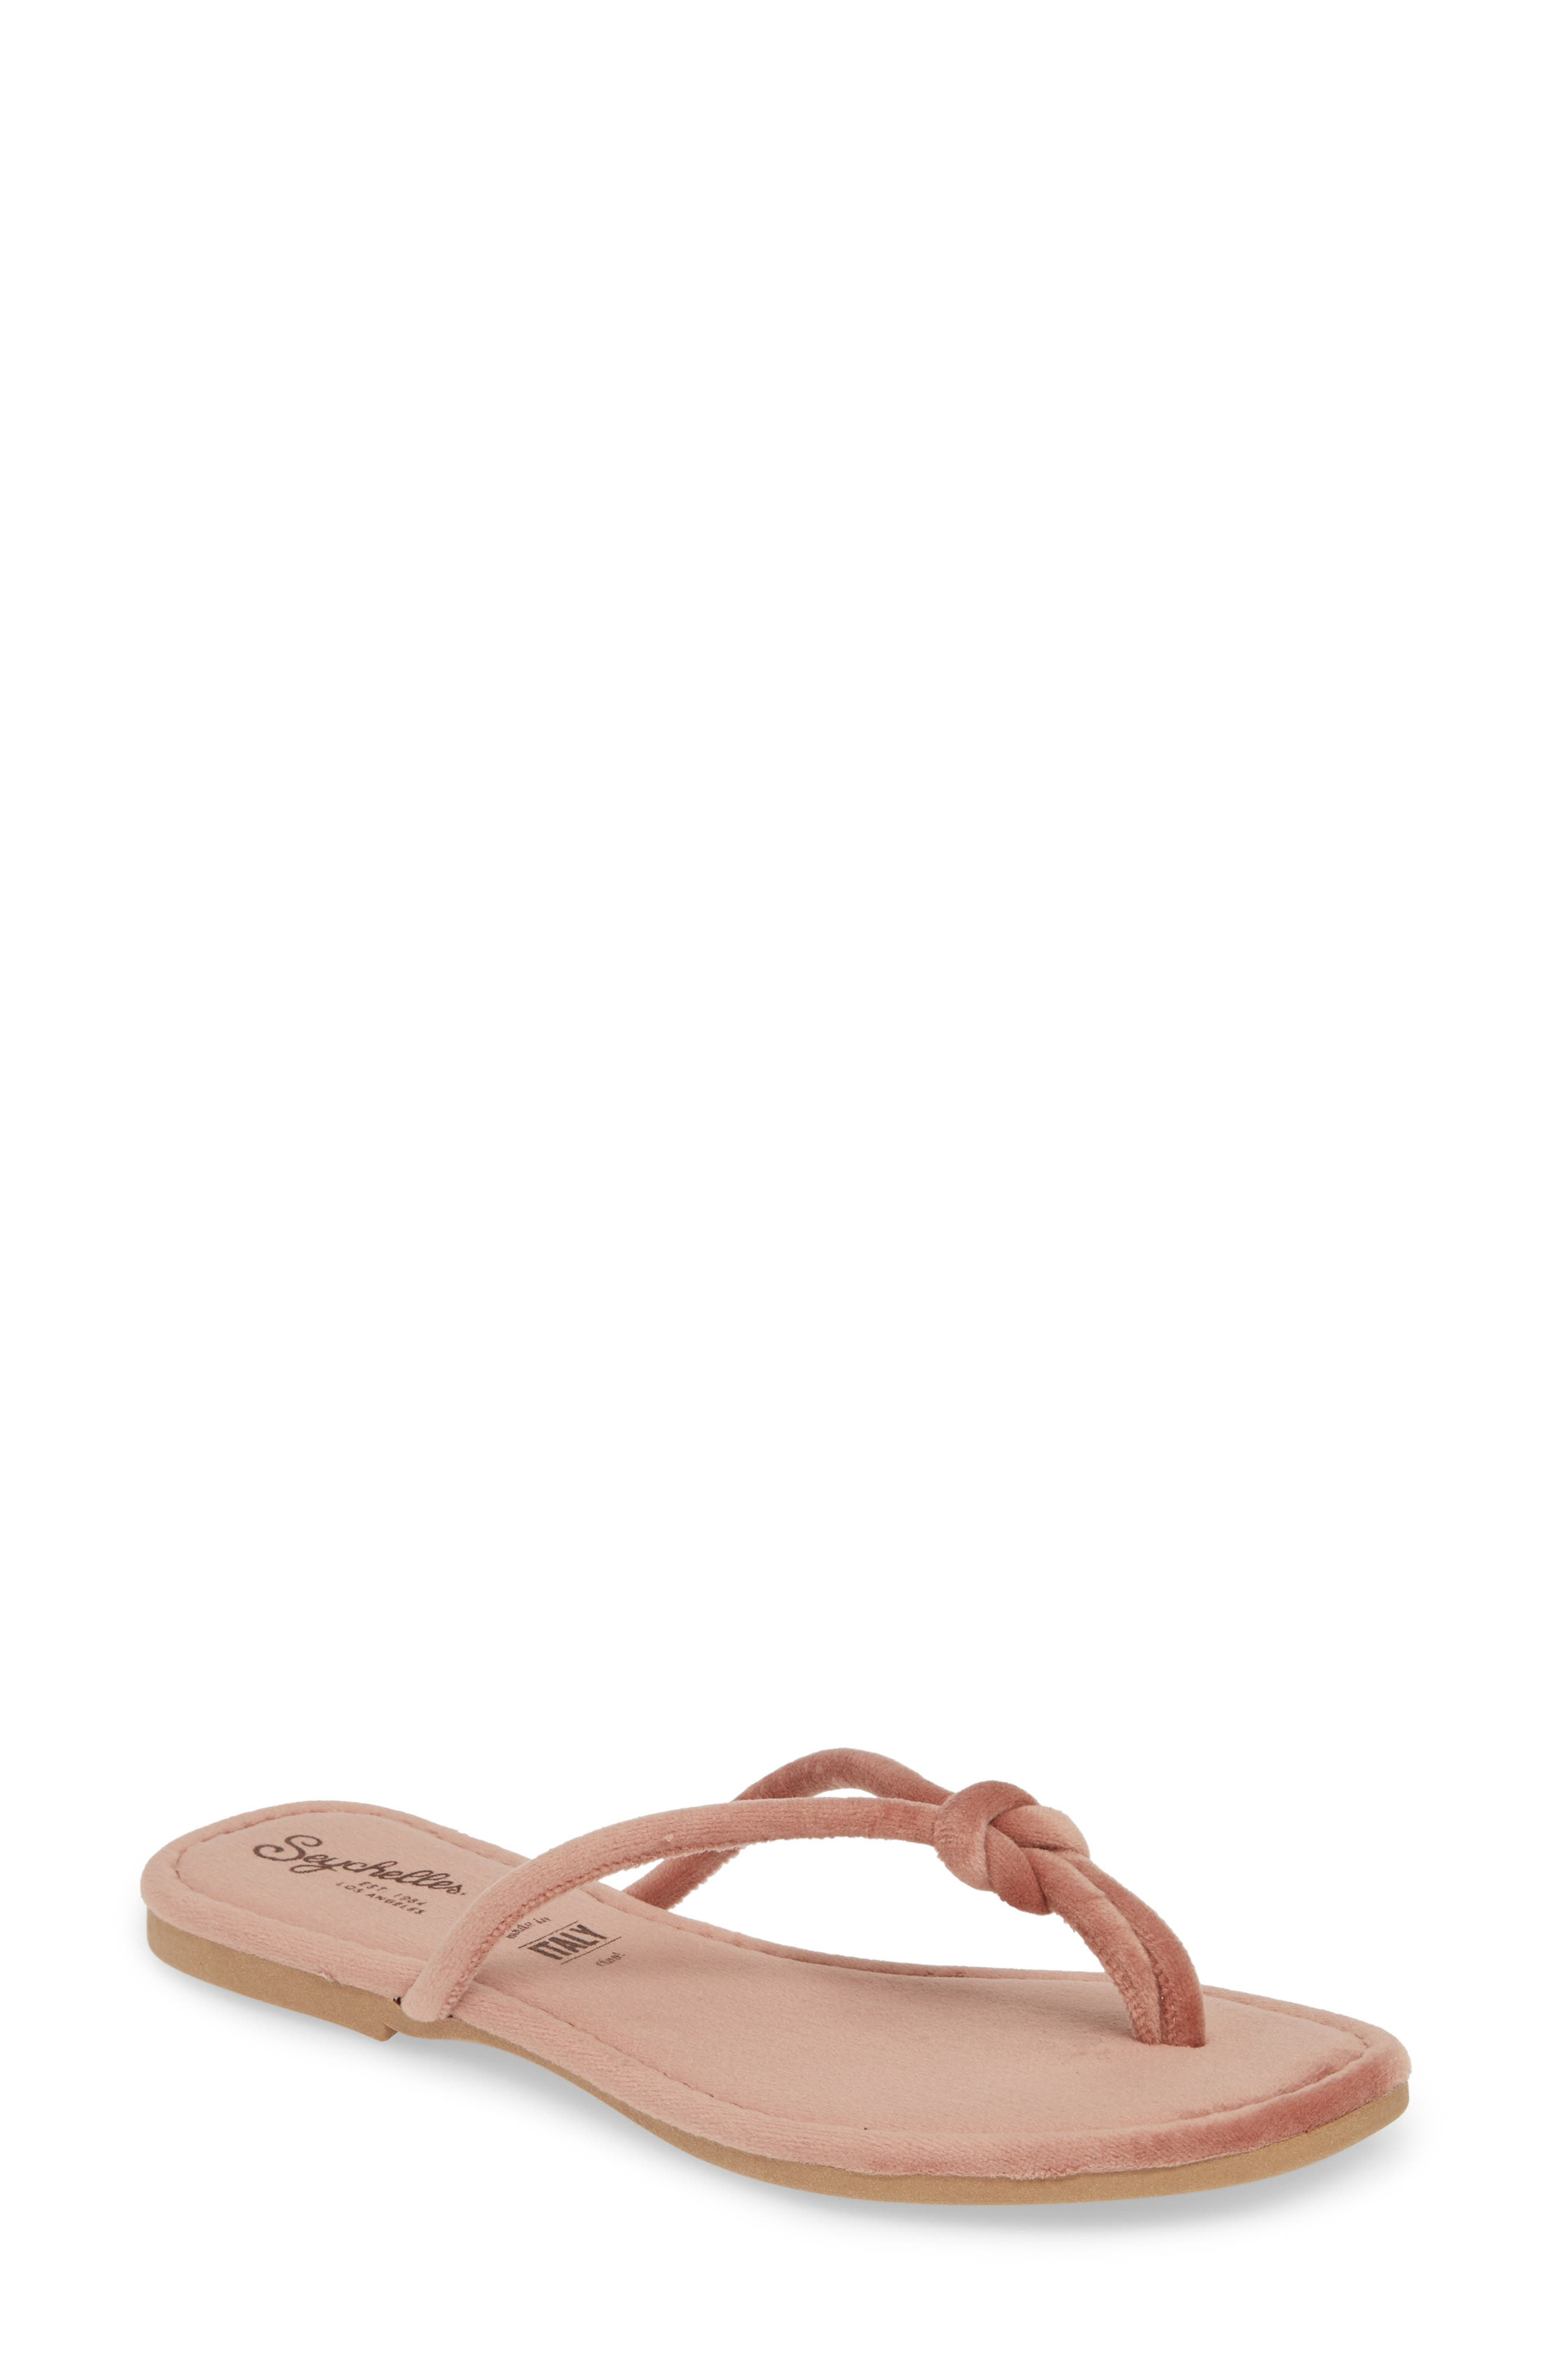 Seychelles Lifelong Flip Flop, Pink